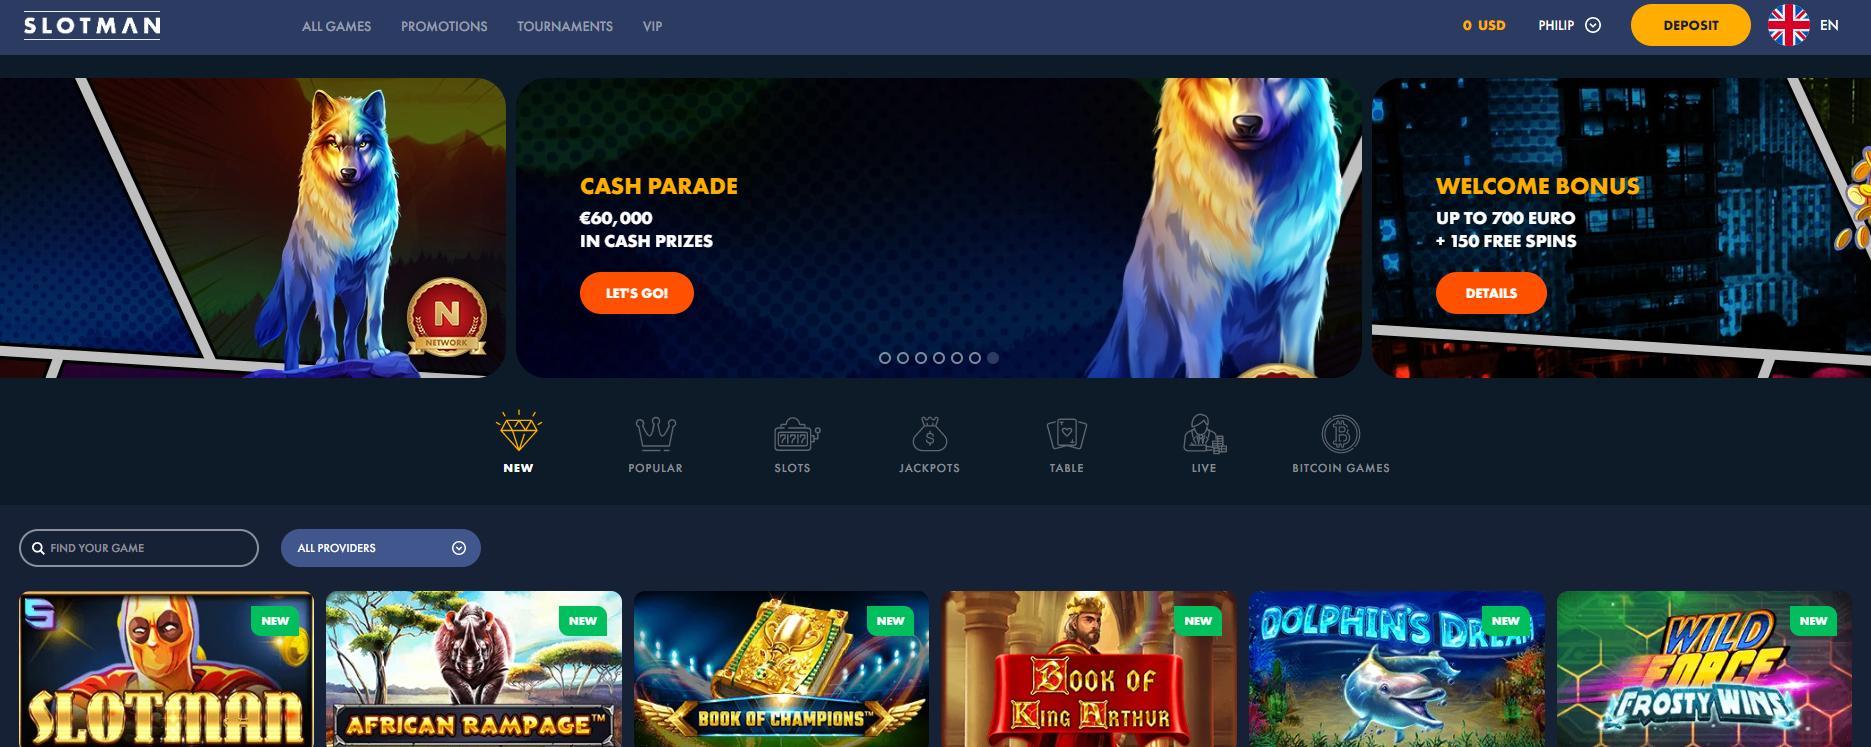 slotman homepage